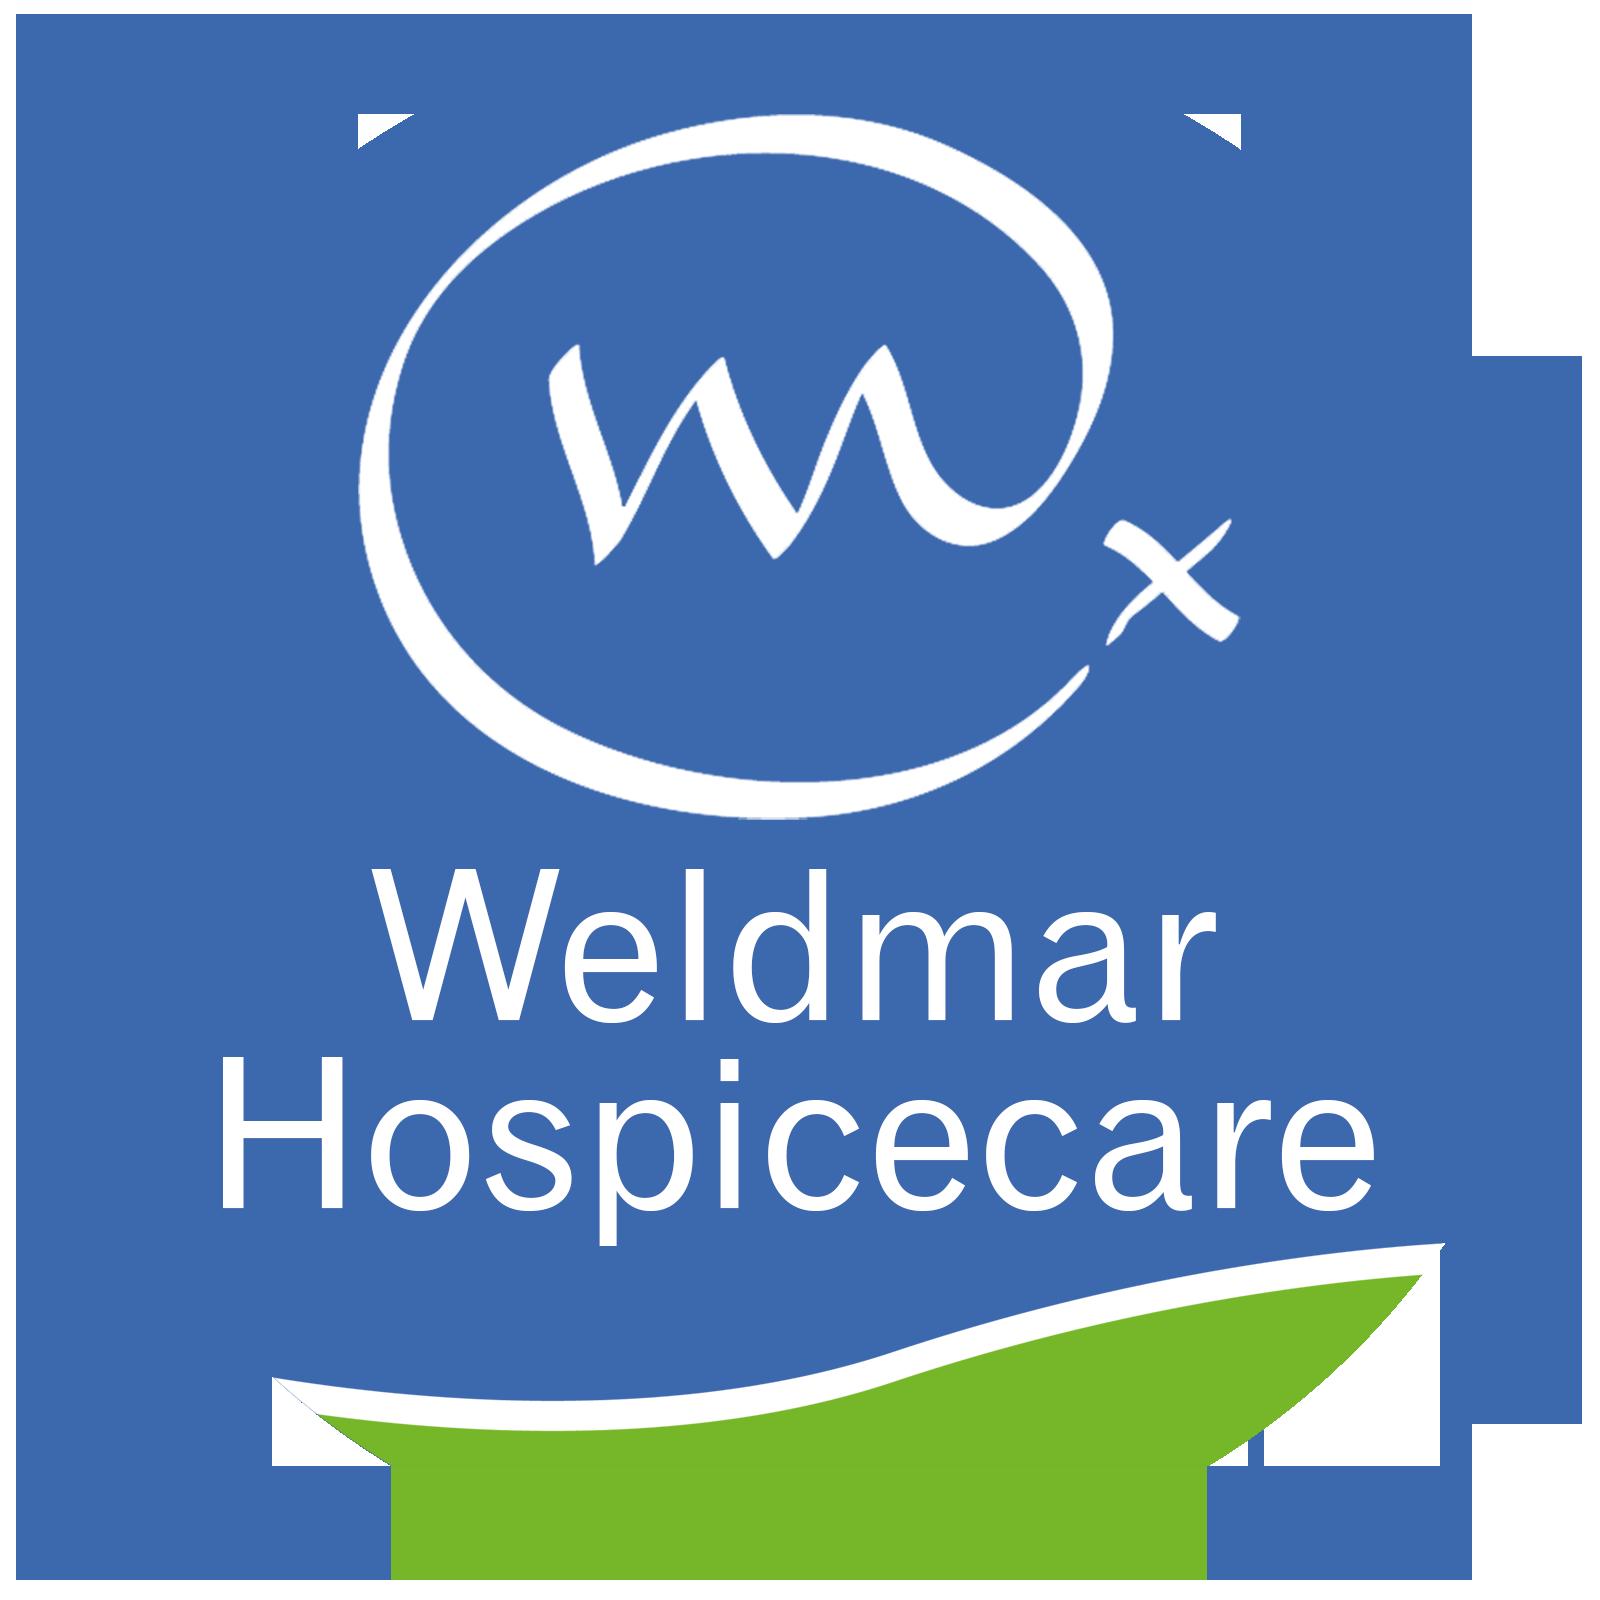 weldmar badge 2020 two line text